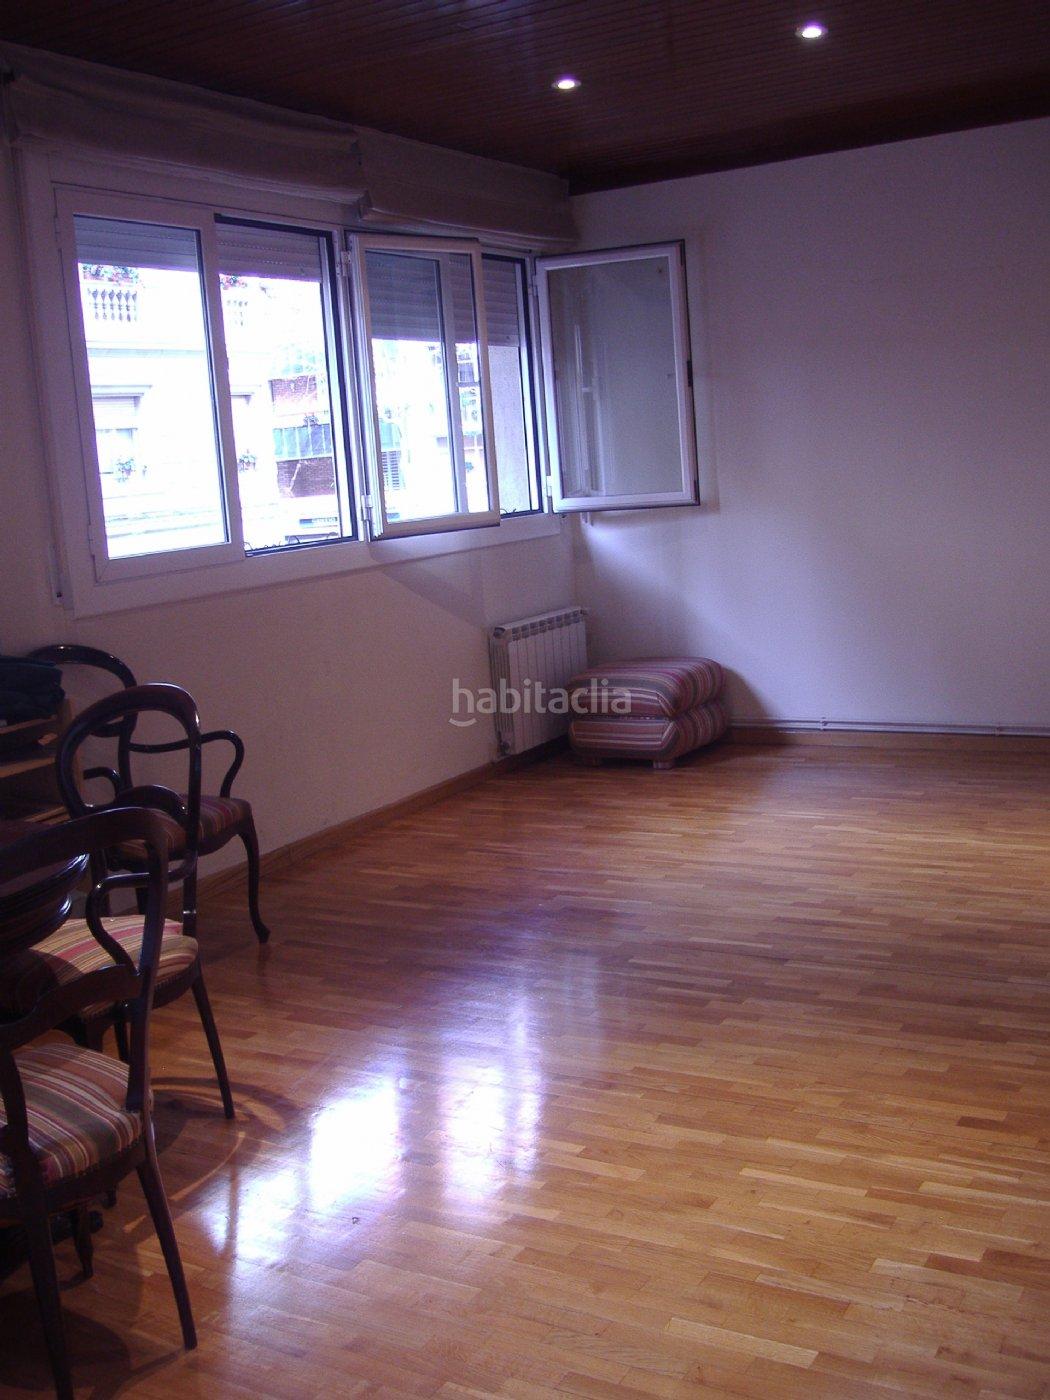 Alquiler piso por en carrer rector ubach tranquilo - Piso particular en alquiler barcelona ...